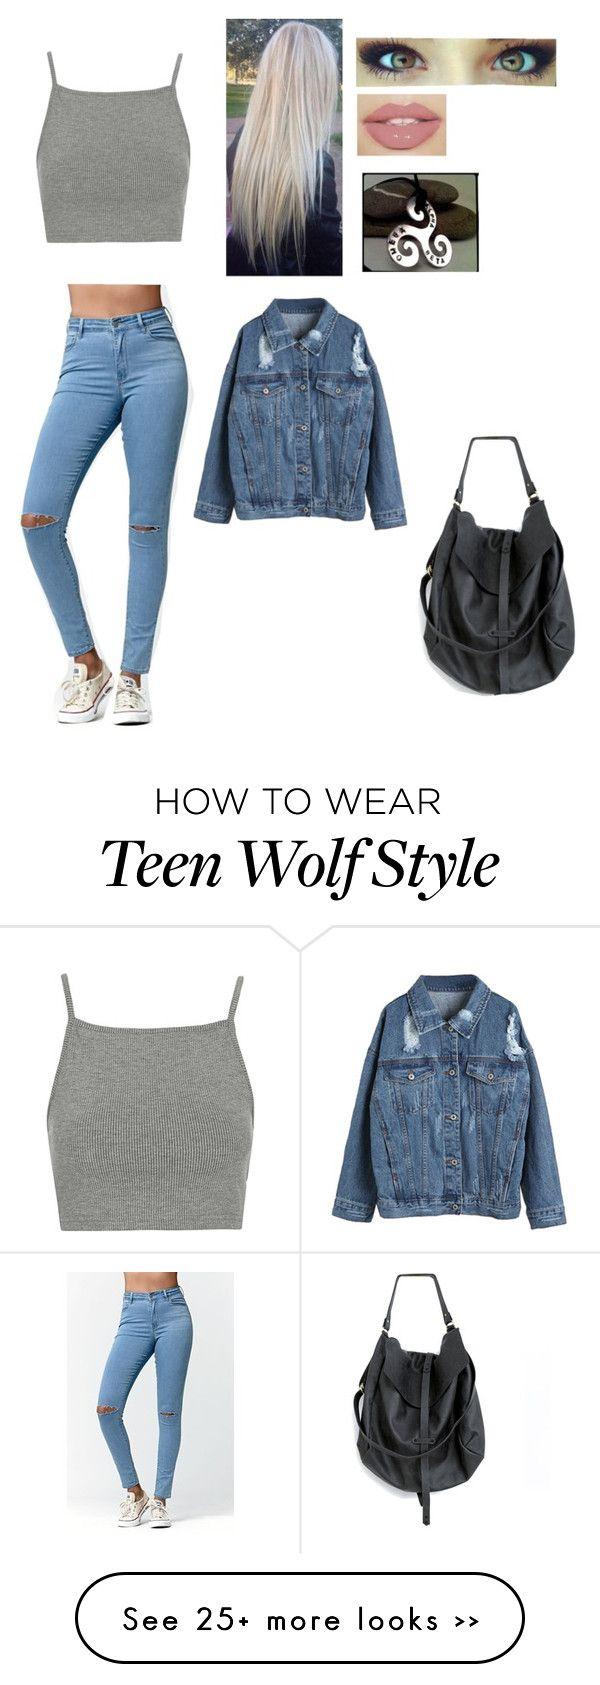 """#1202 Teen Wolf"" by sammygirl995 on Polyvore"